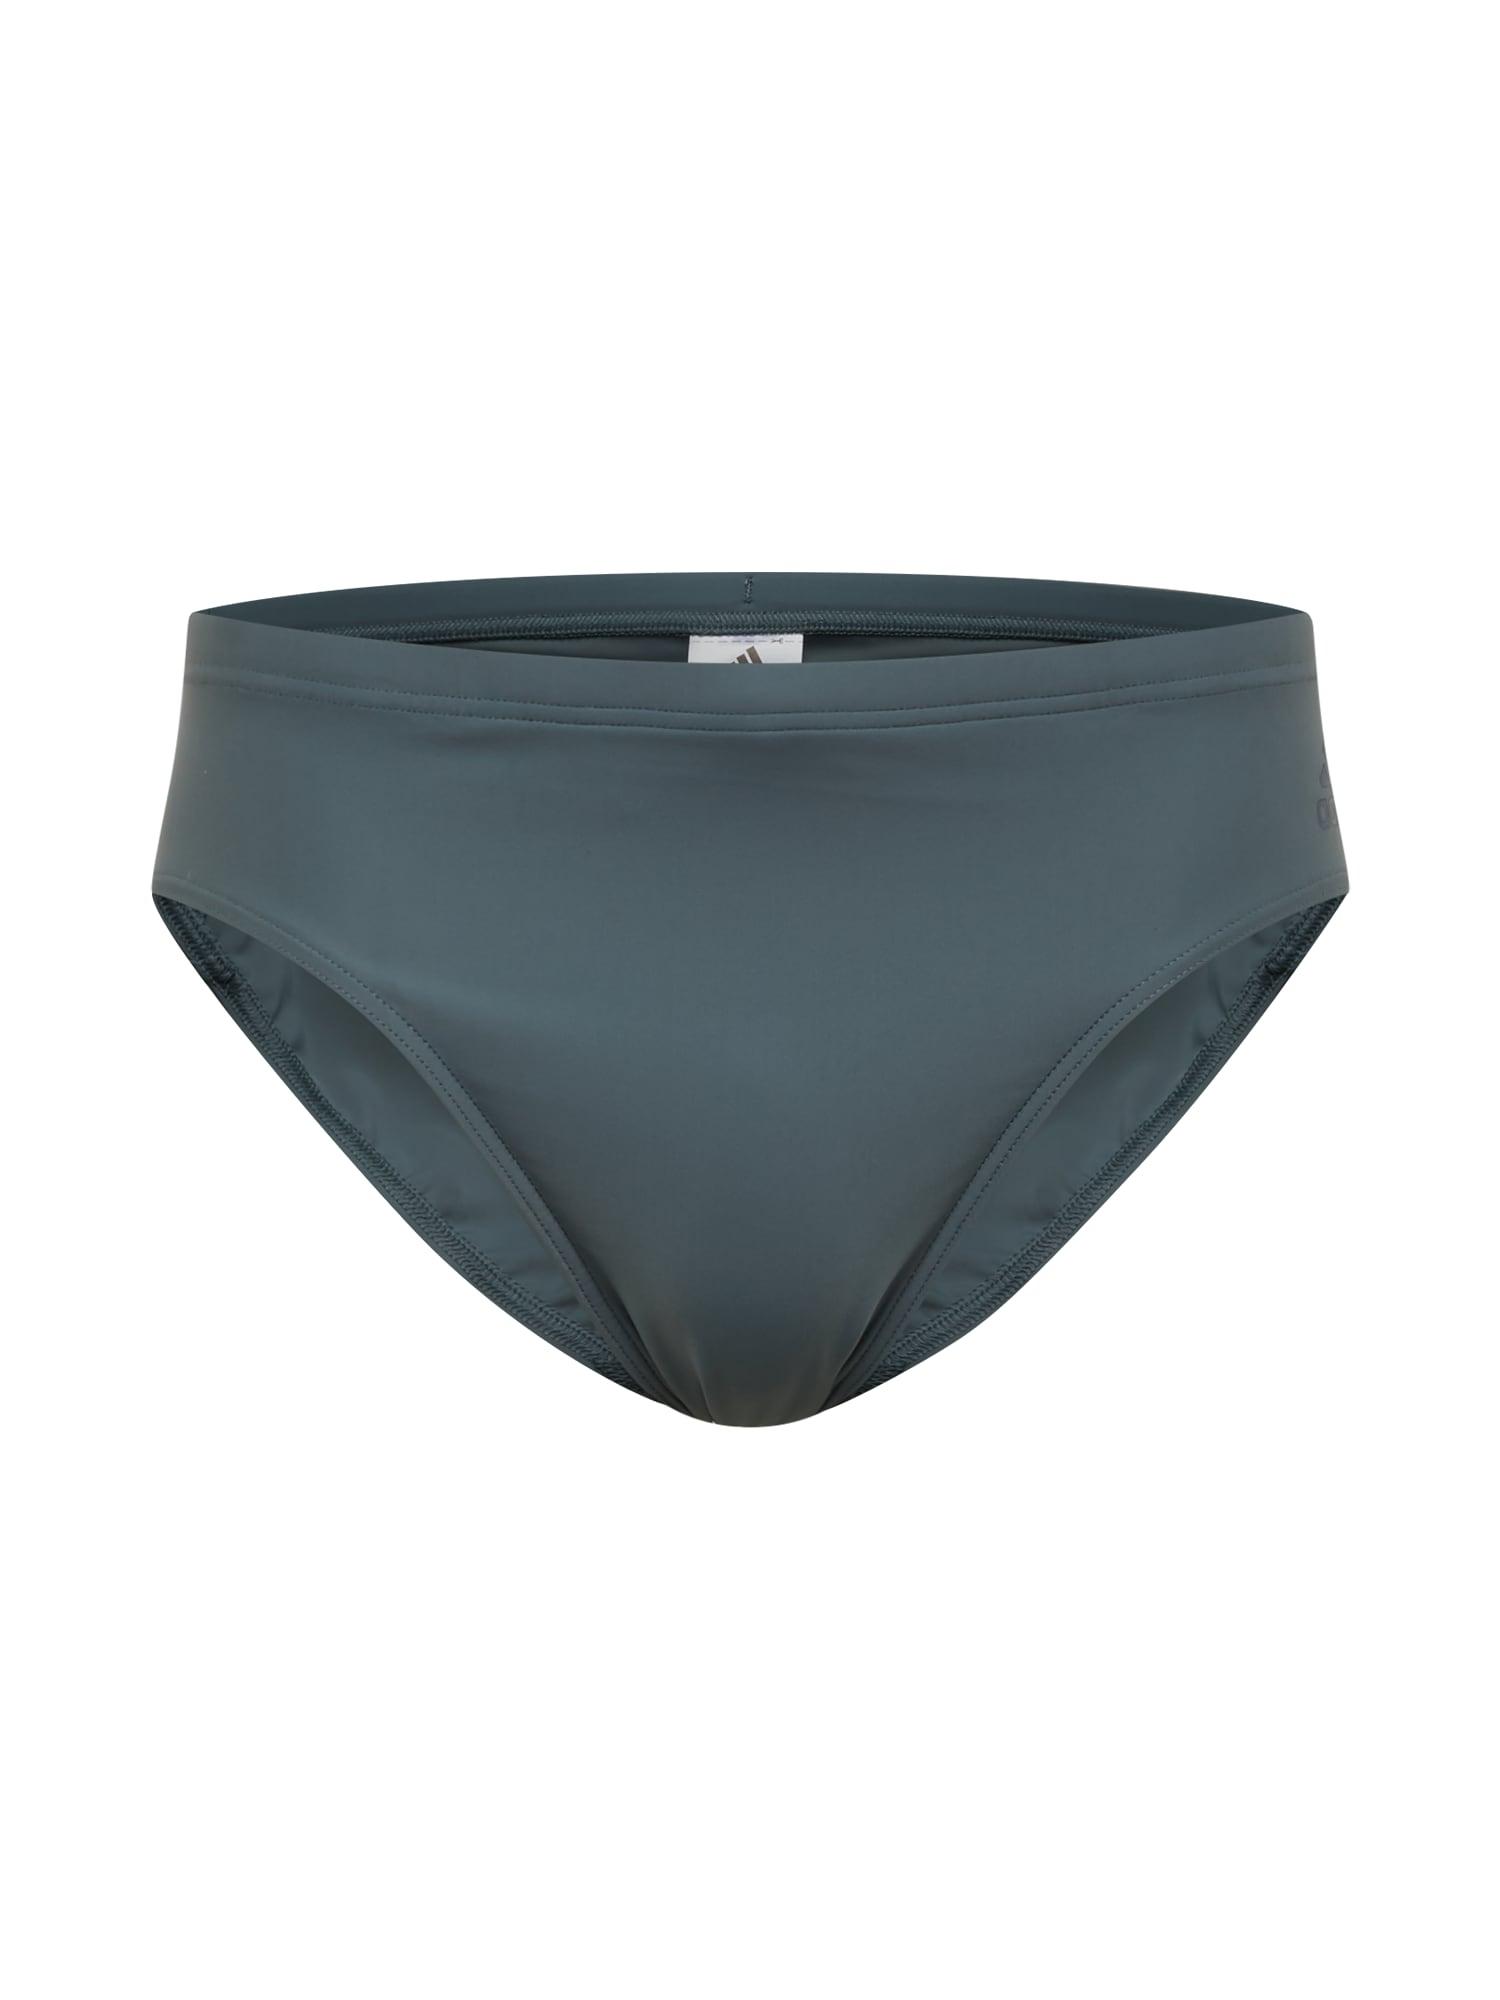 ADIDAS PERFORMANCE Maillot de bain de sport  - Bleu - Taille: 7 - male